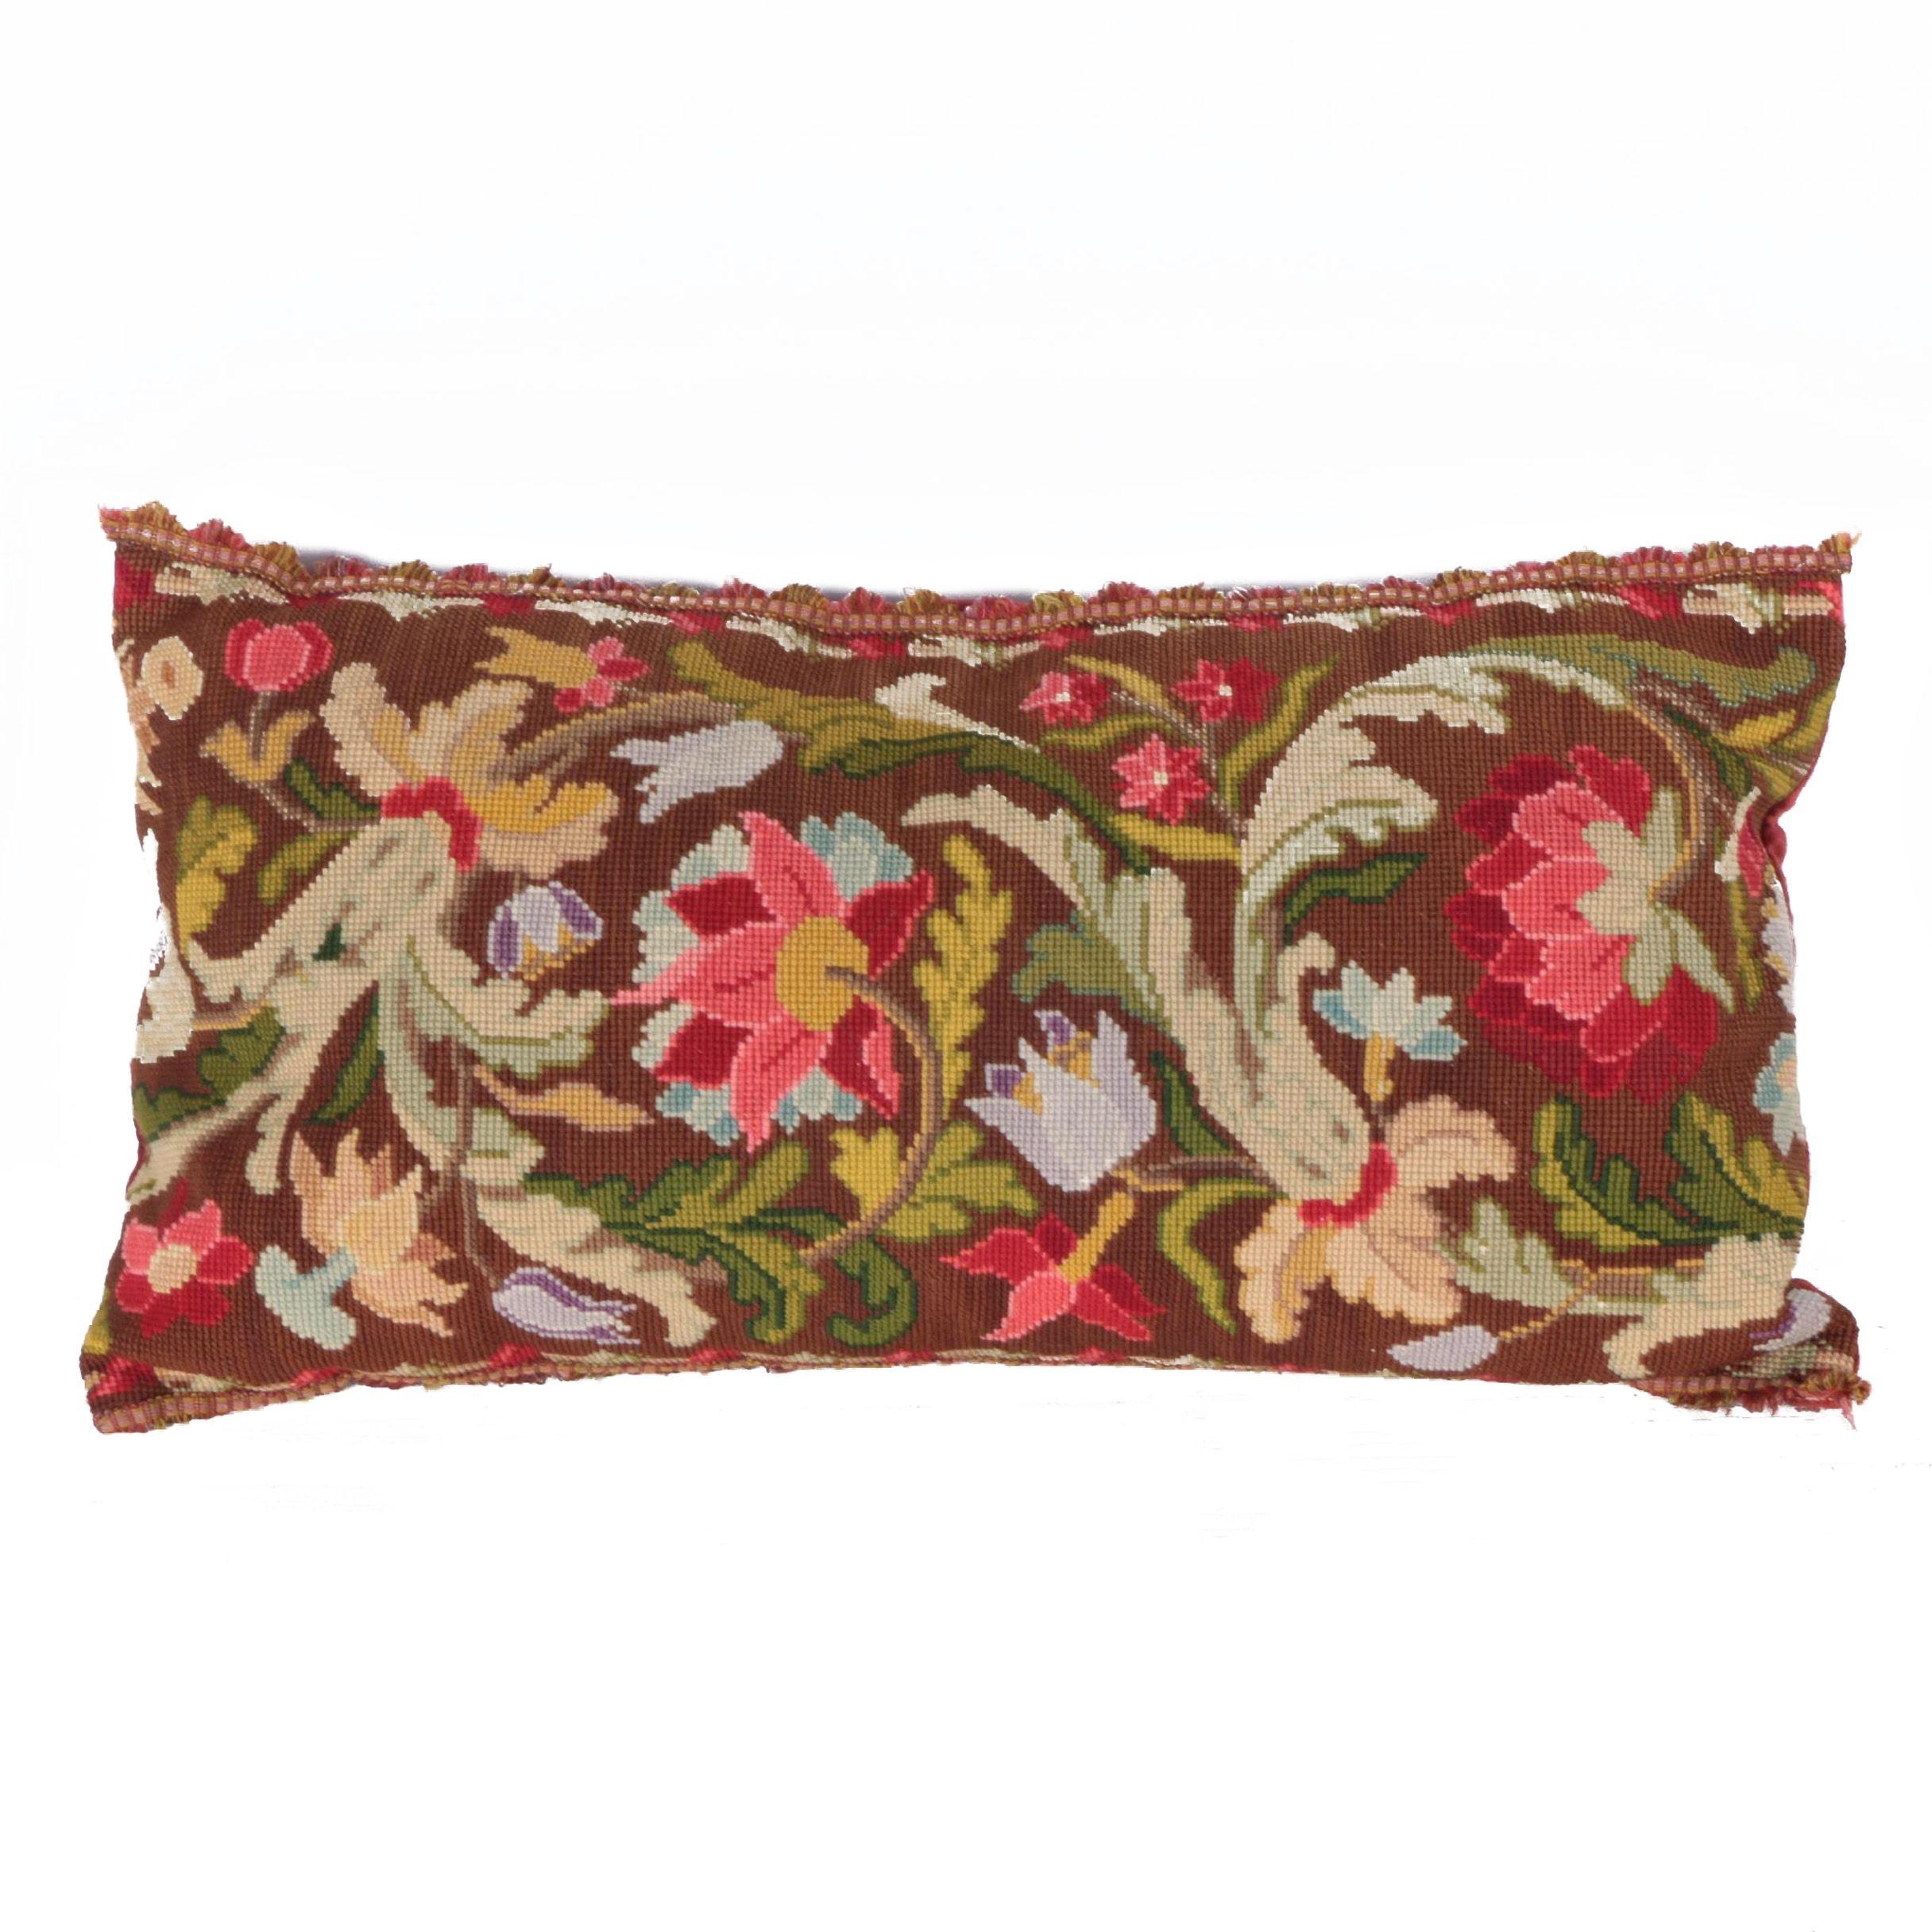 Needlepoint Accent Pillow